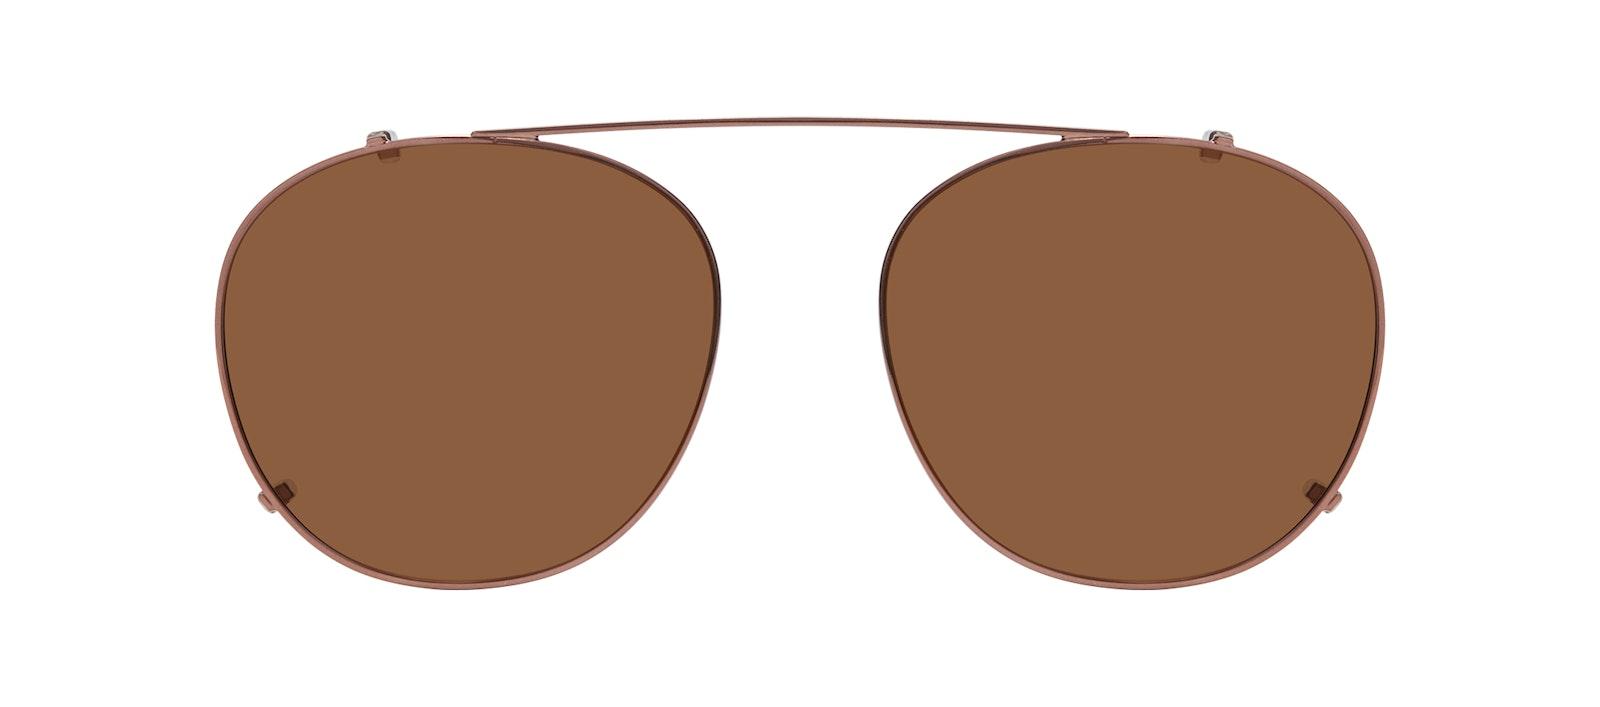 Affordable Fashion Glasses Accessory Men Women Divine Clip L Copper Front